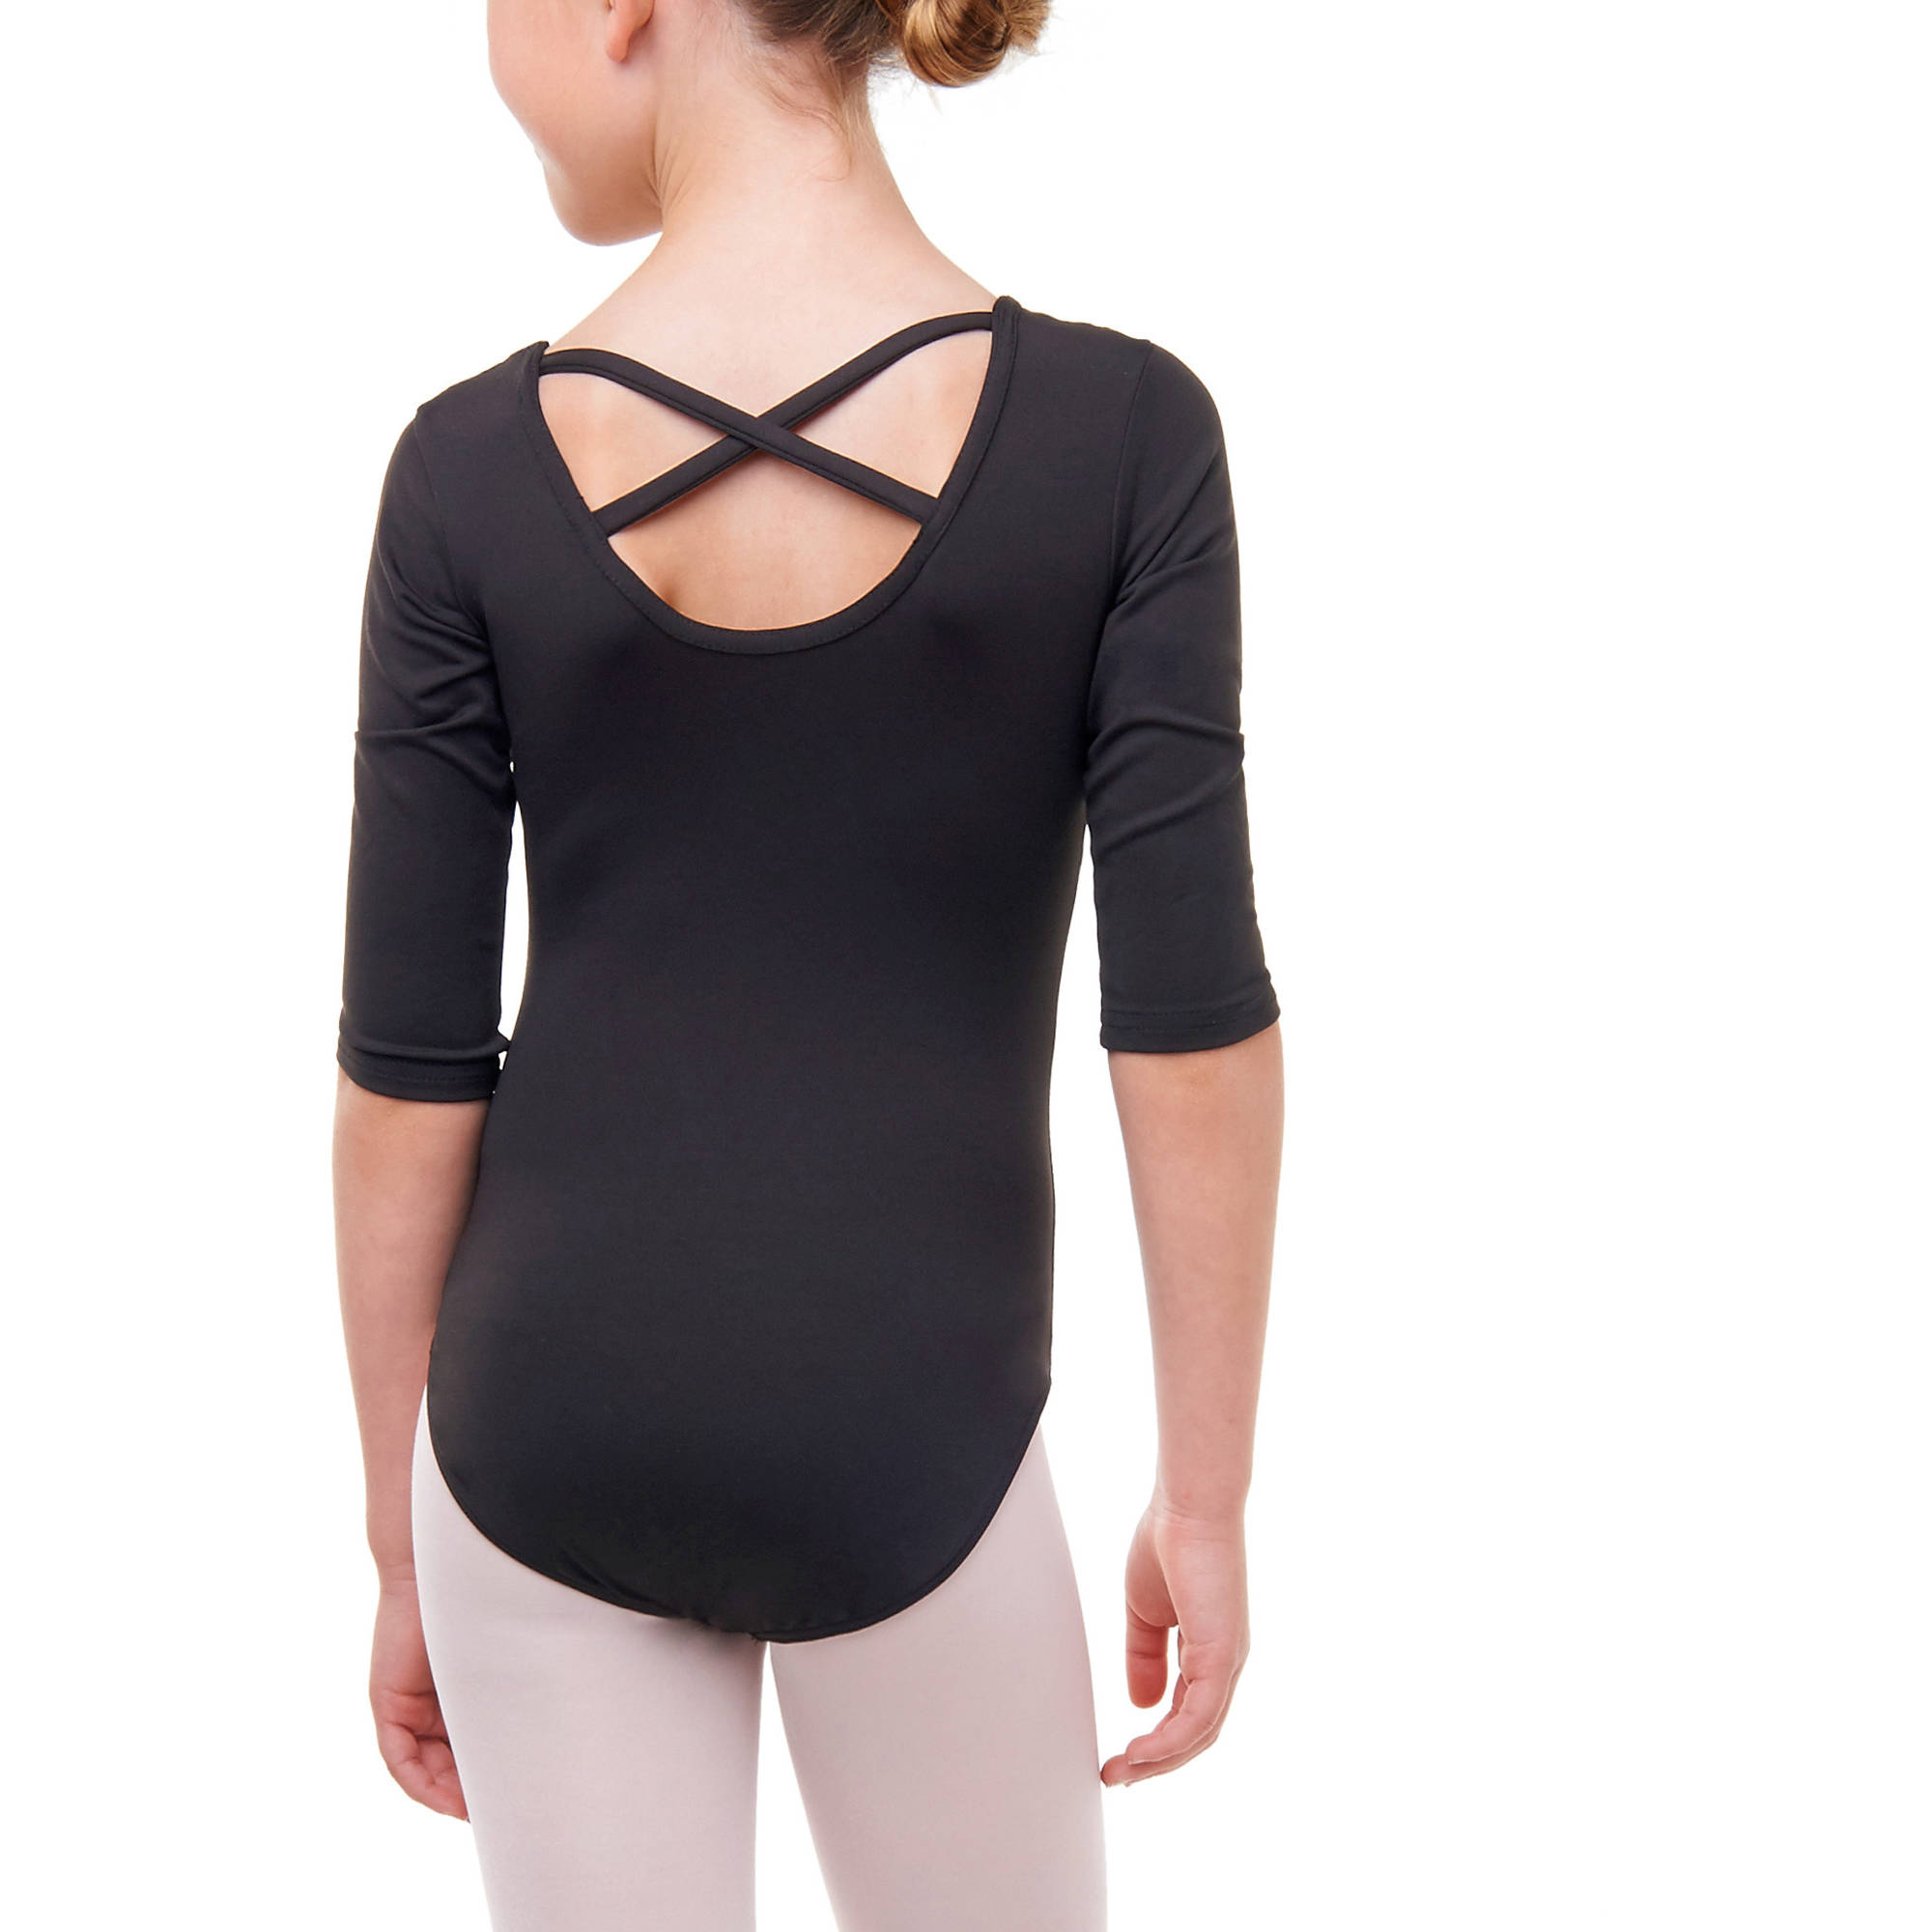 9535e53210b2 Danskin Now - Girls  3 4 Sleeve Premium Dance Leotard With Strappy ...